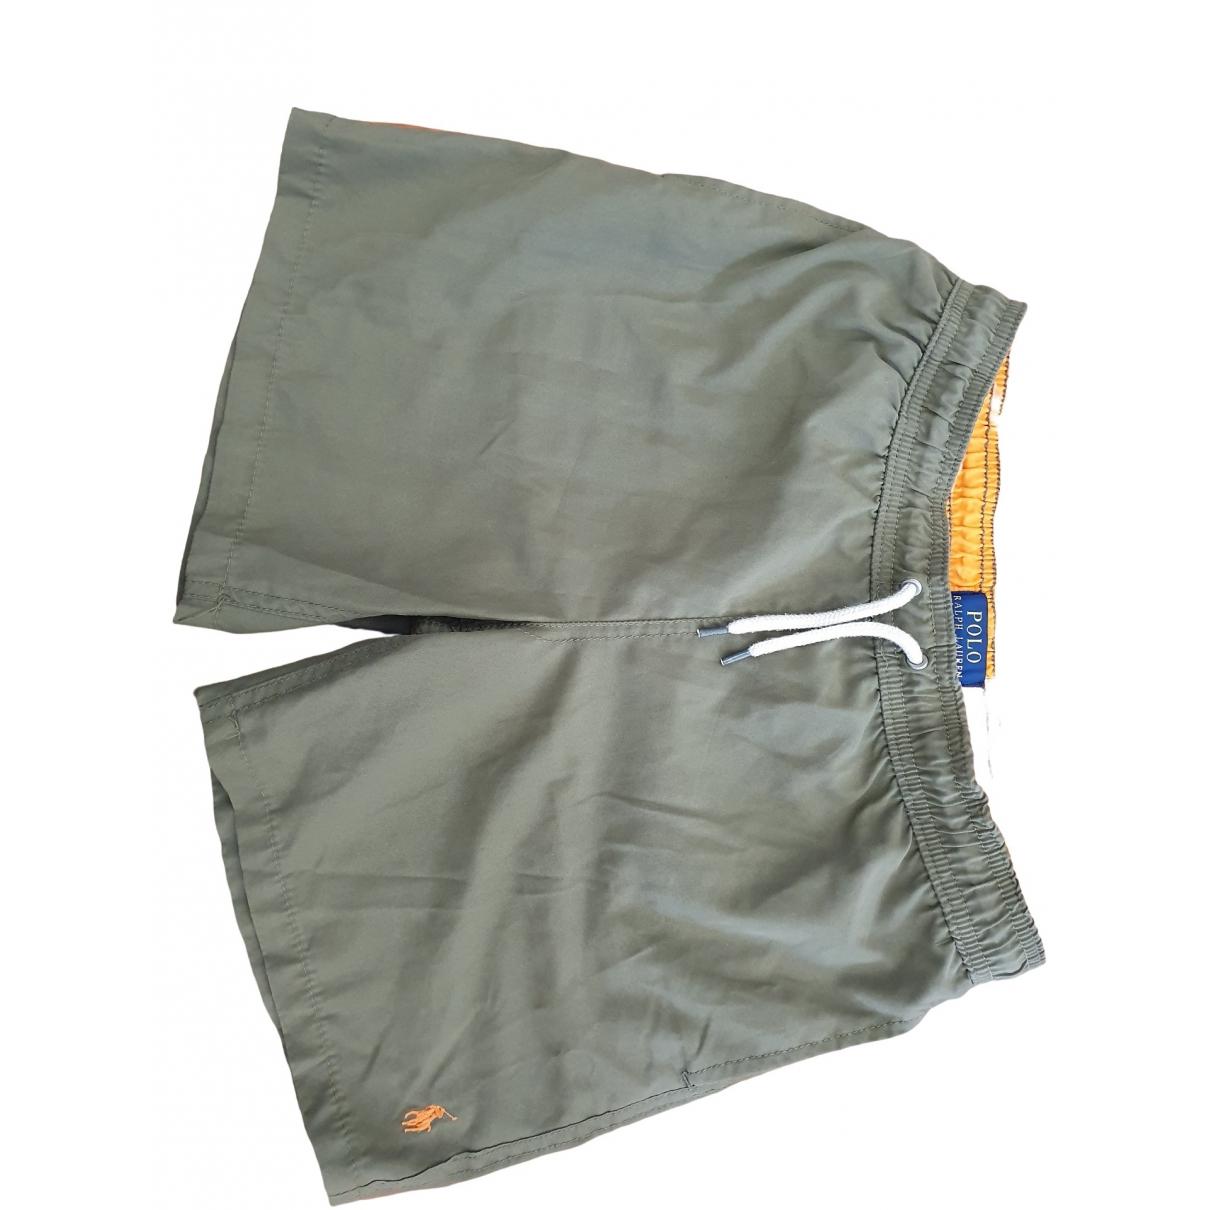 Polo Ralph Lauren \N Shorts in  Gruen Polyester